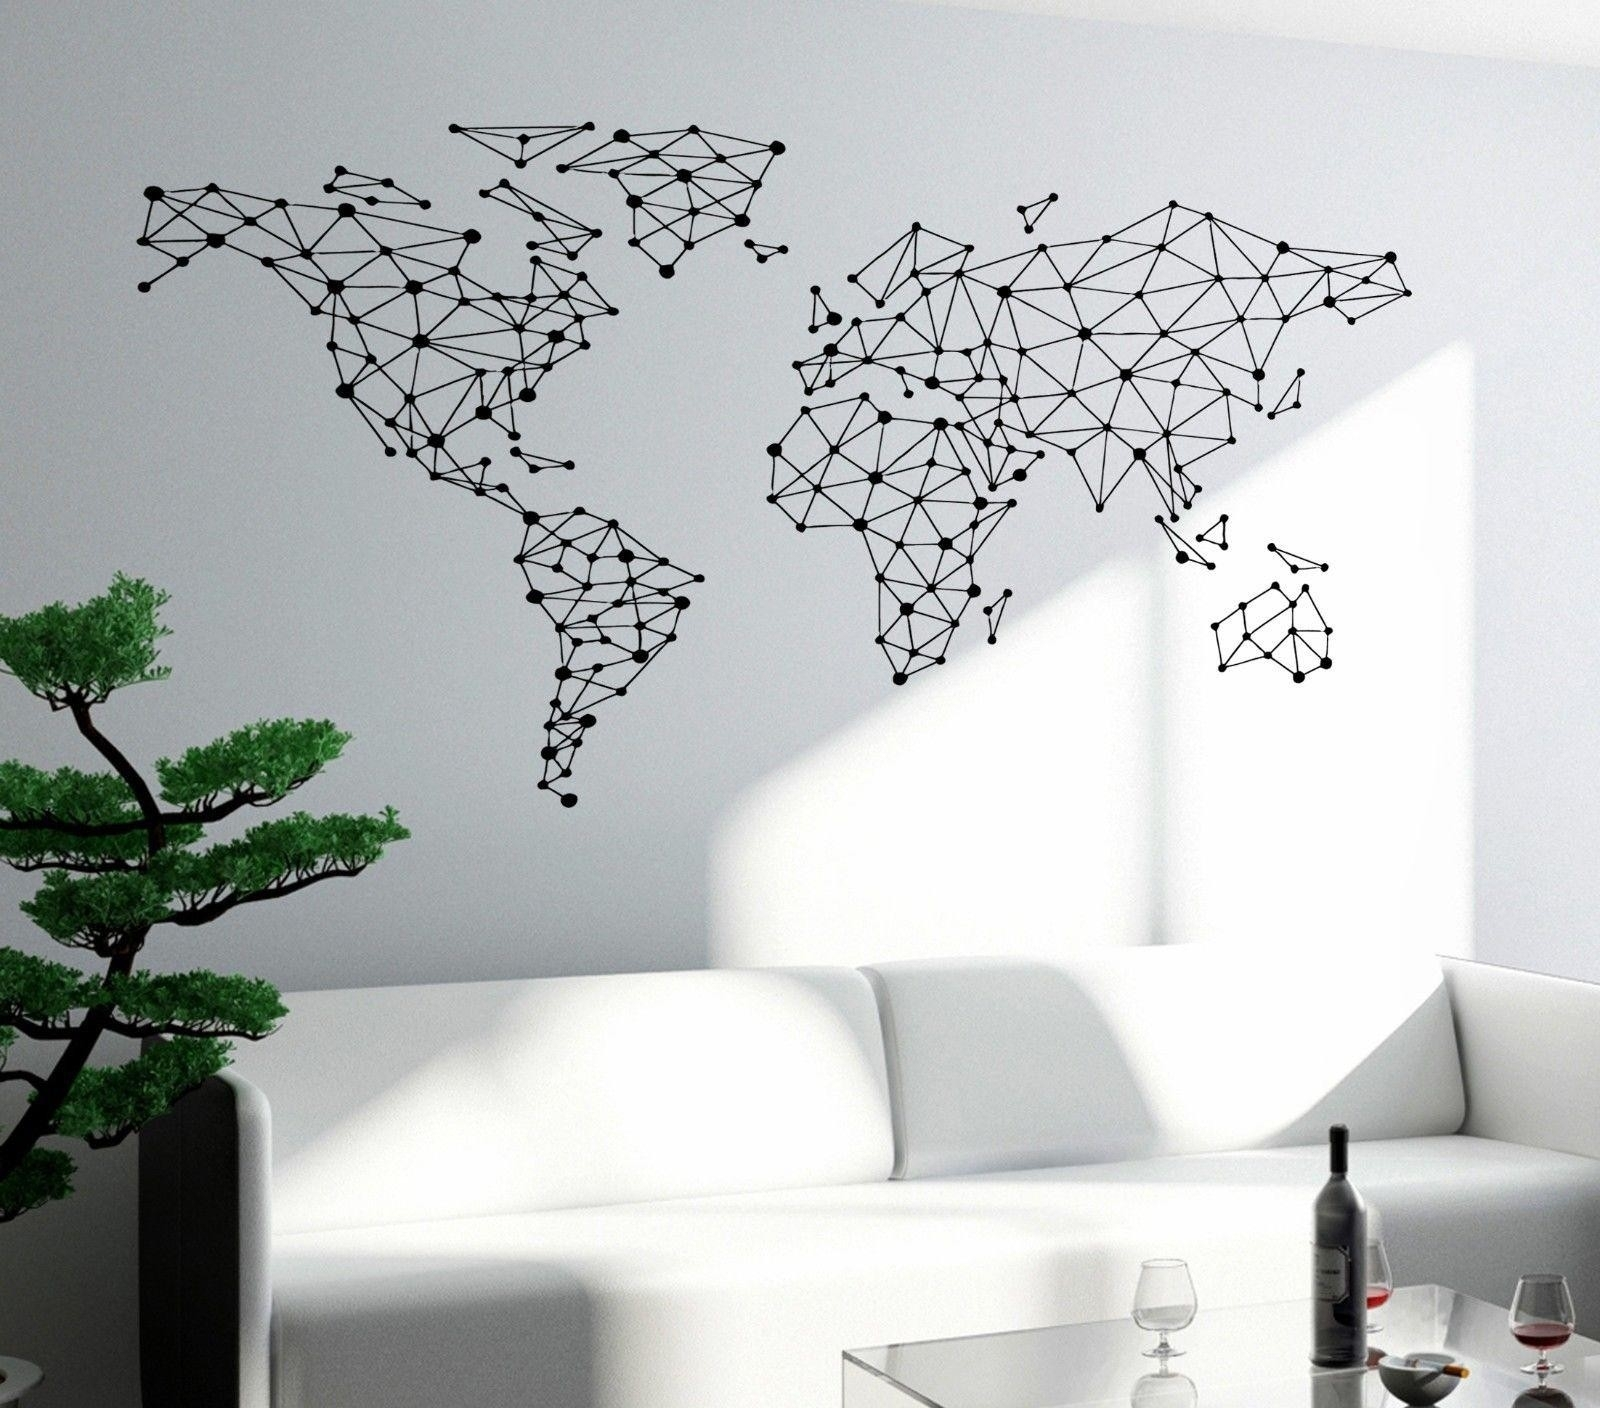 World Map Wall Art – World Maps Collection Regarding Newest Maps Wall Art (Gallery 5 of 20)